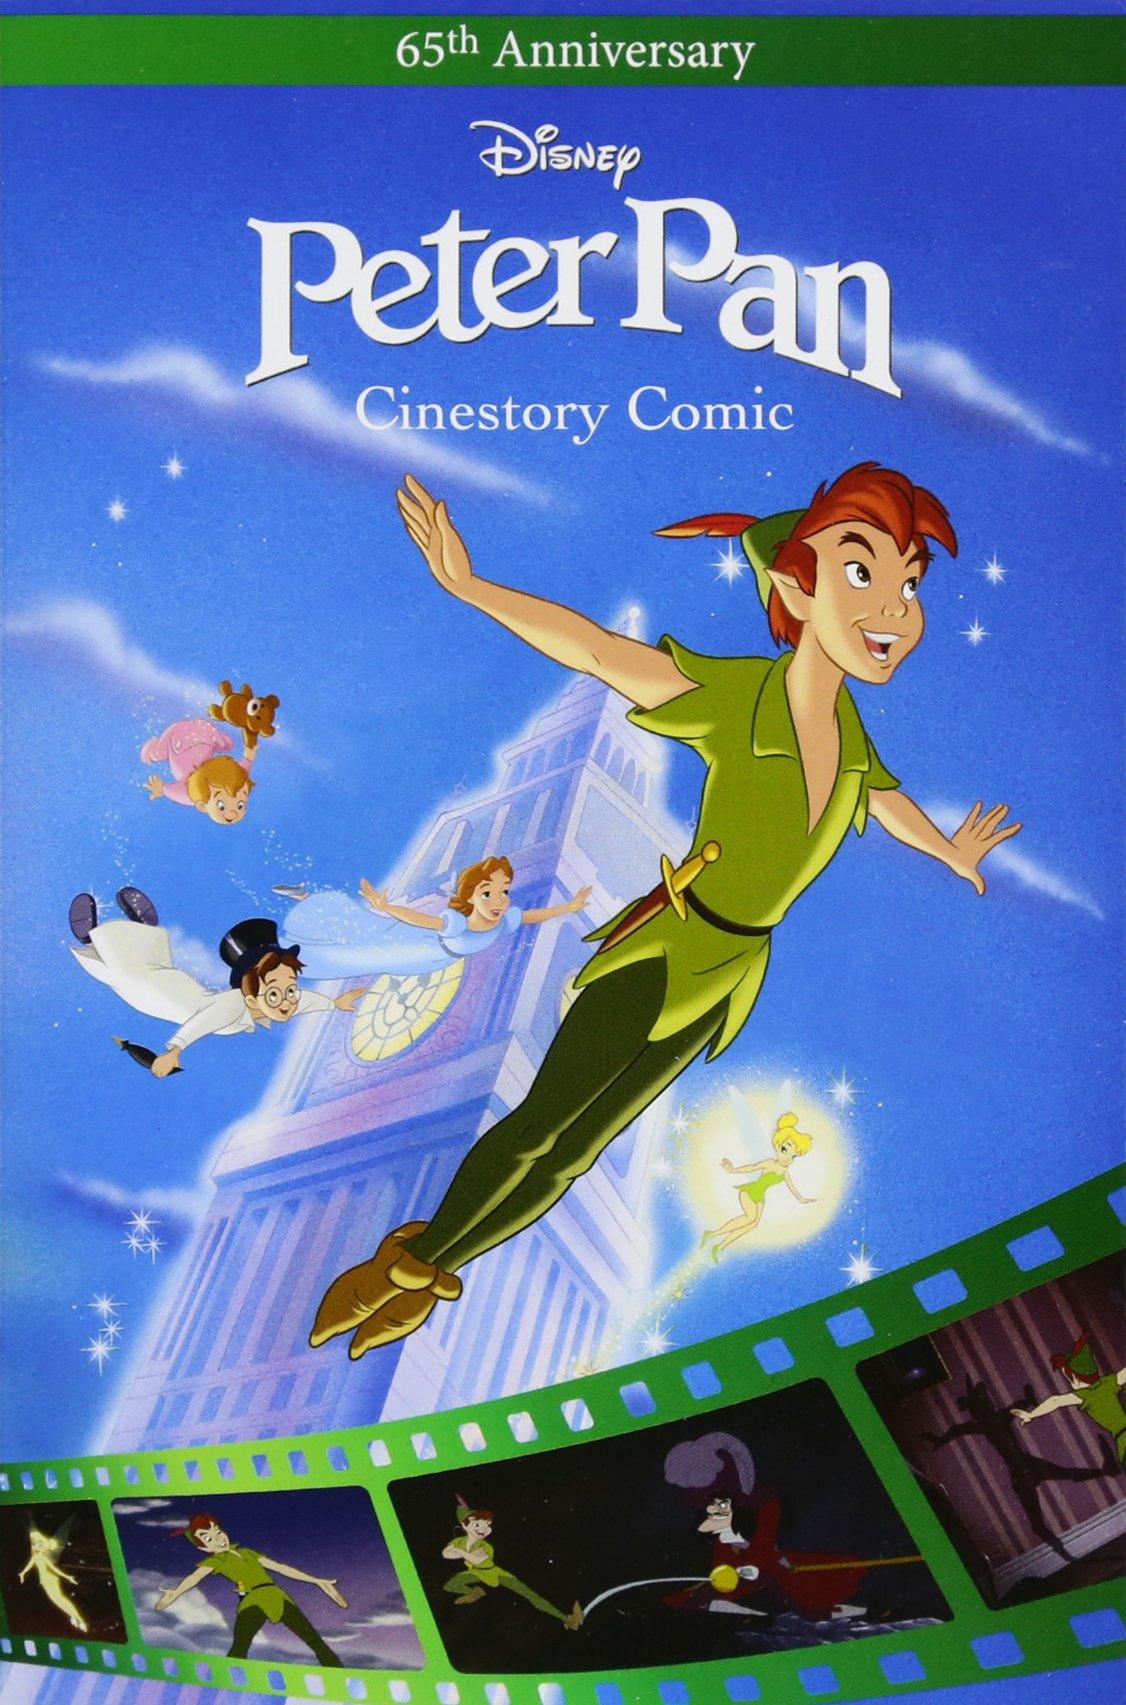 Amazoncom Disney Peter Pan Cinestory Comic 9781772756418 Disney